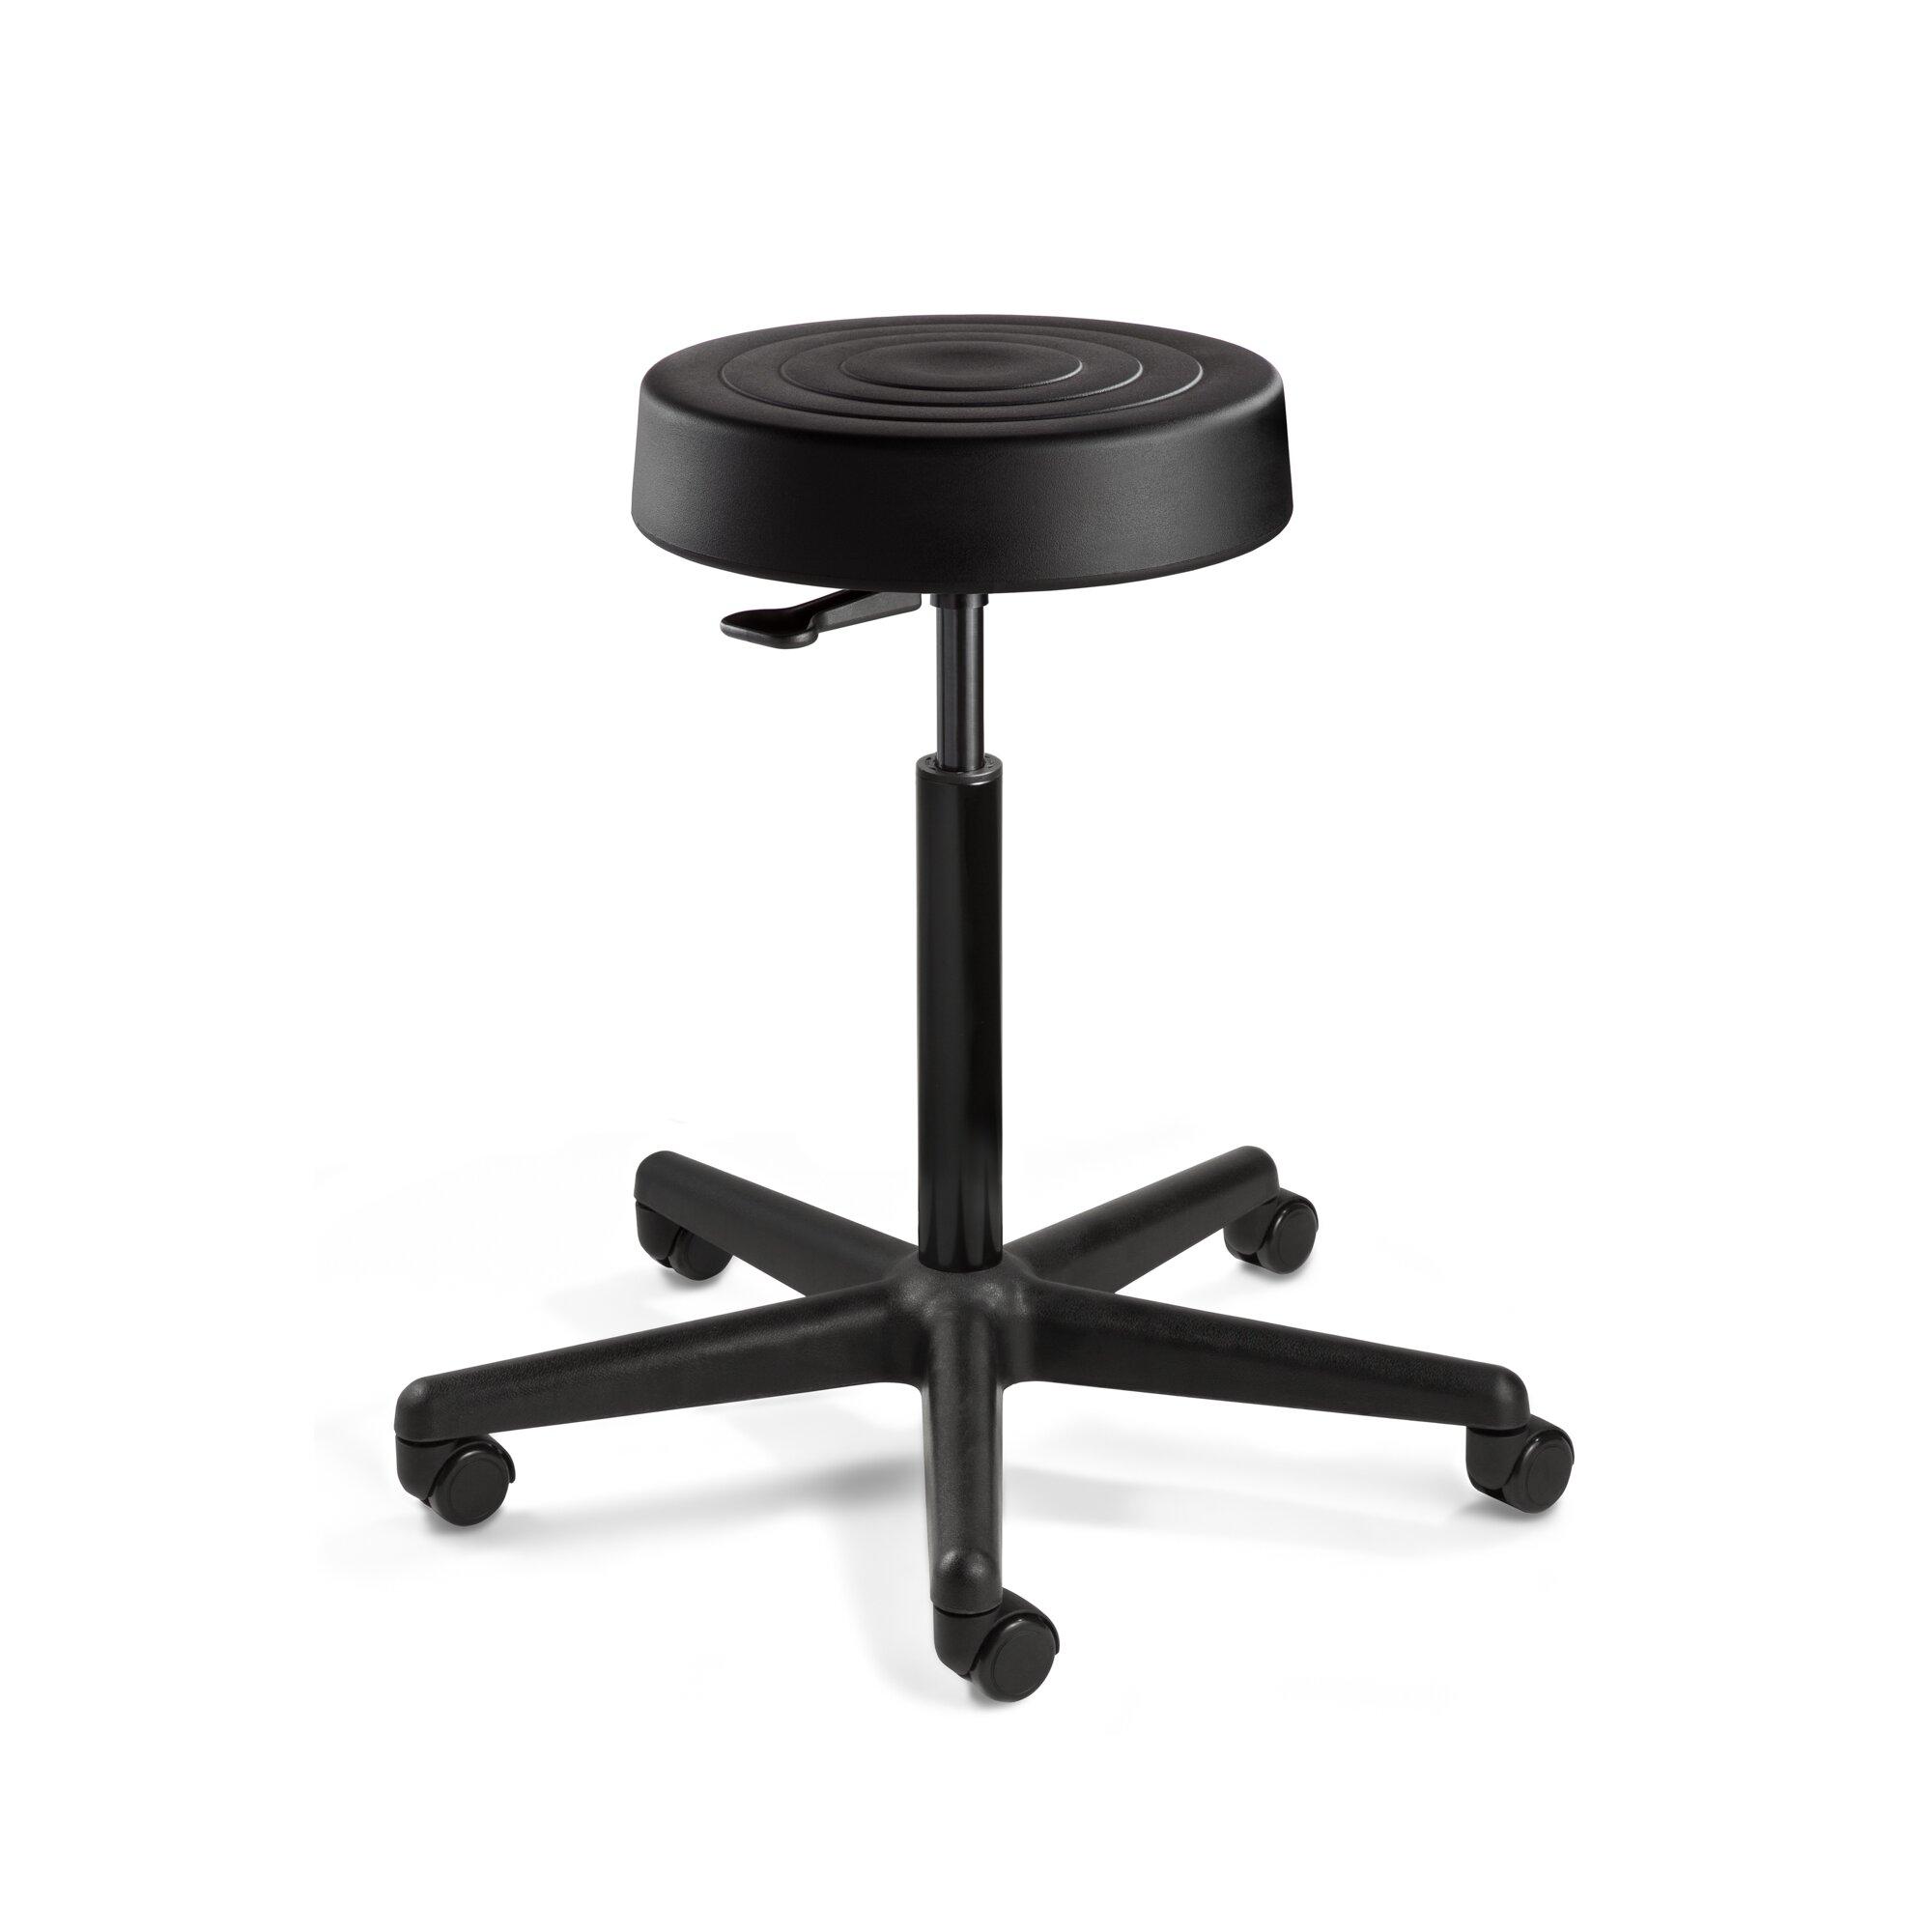 bevco ergolux height adjustable stool with casters wayfair. Black Bedroom Furniture Sets. Home Design Ideas